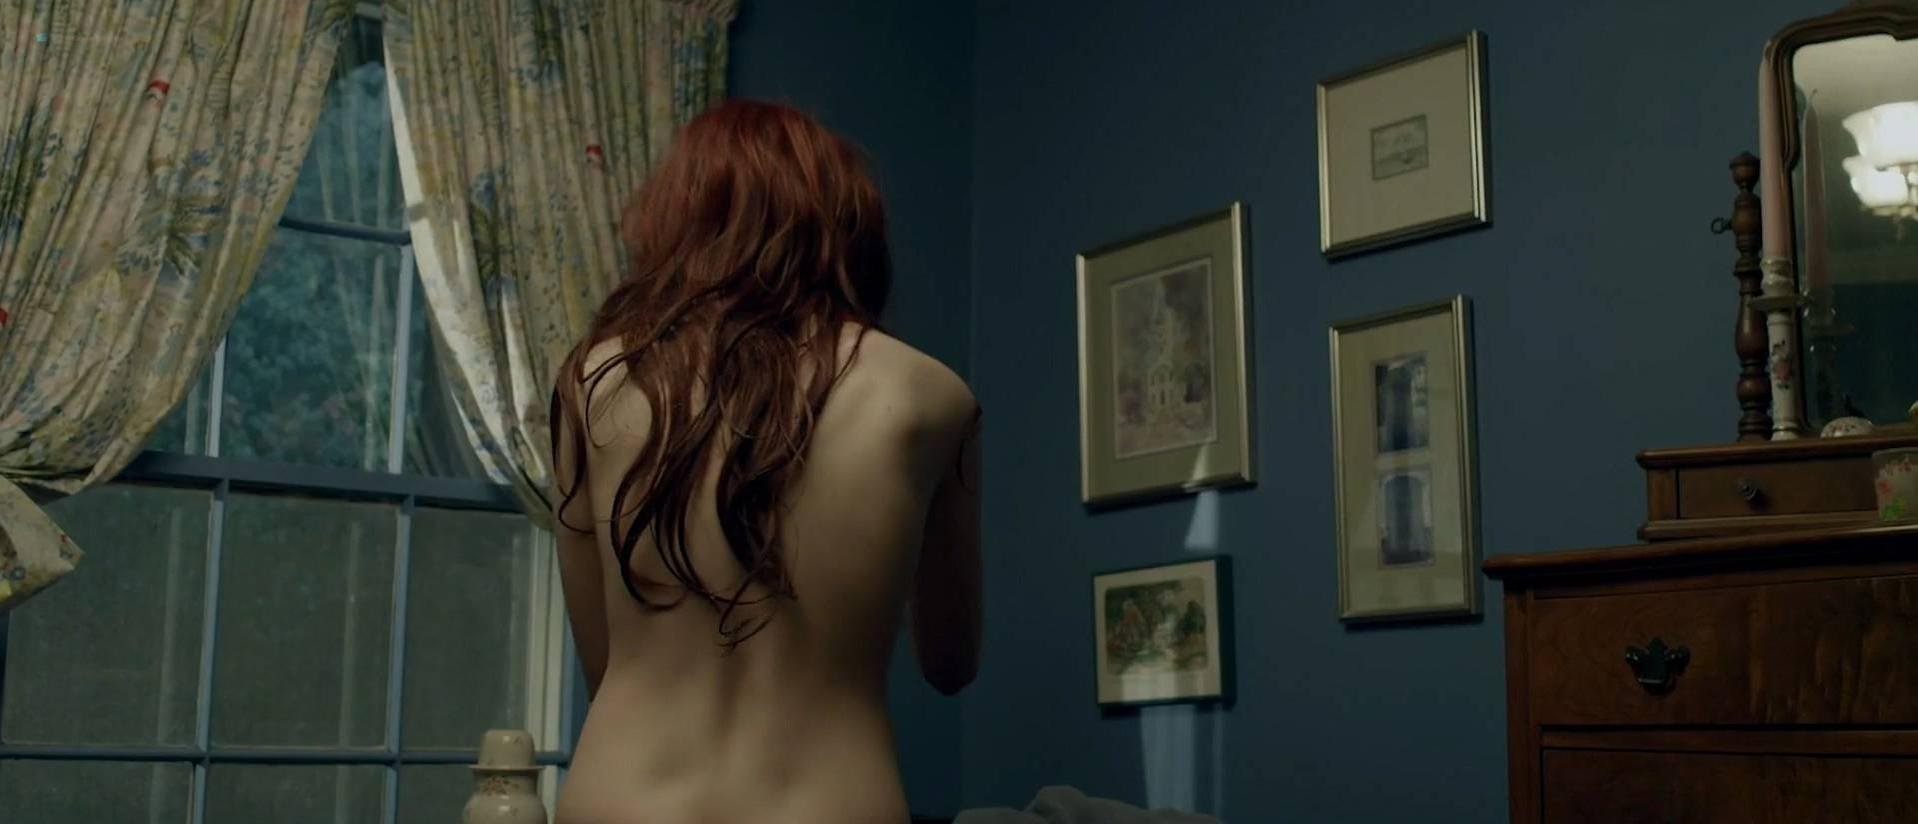 Alicia Underwood nude - Ghost Note (2017)